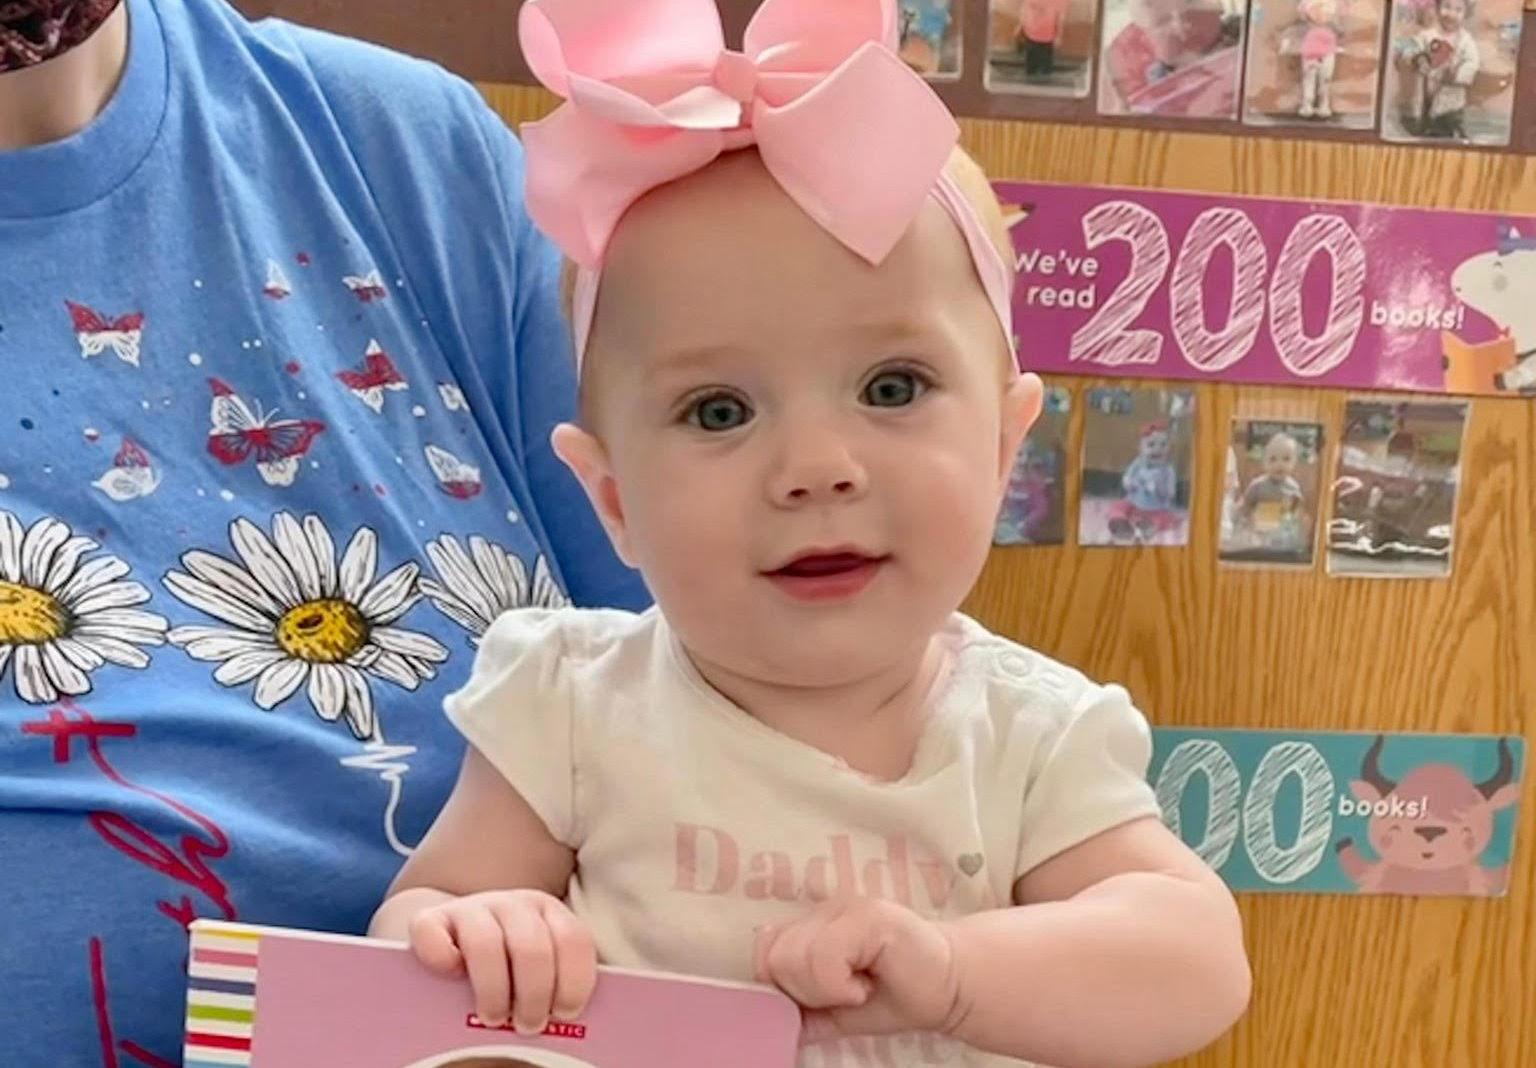 Addison Thomason reaches milestone in 1000 Books Before Kindergarten Program at the Library